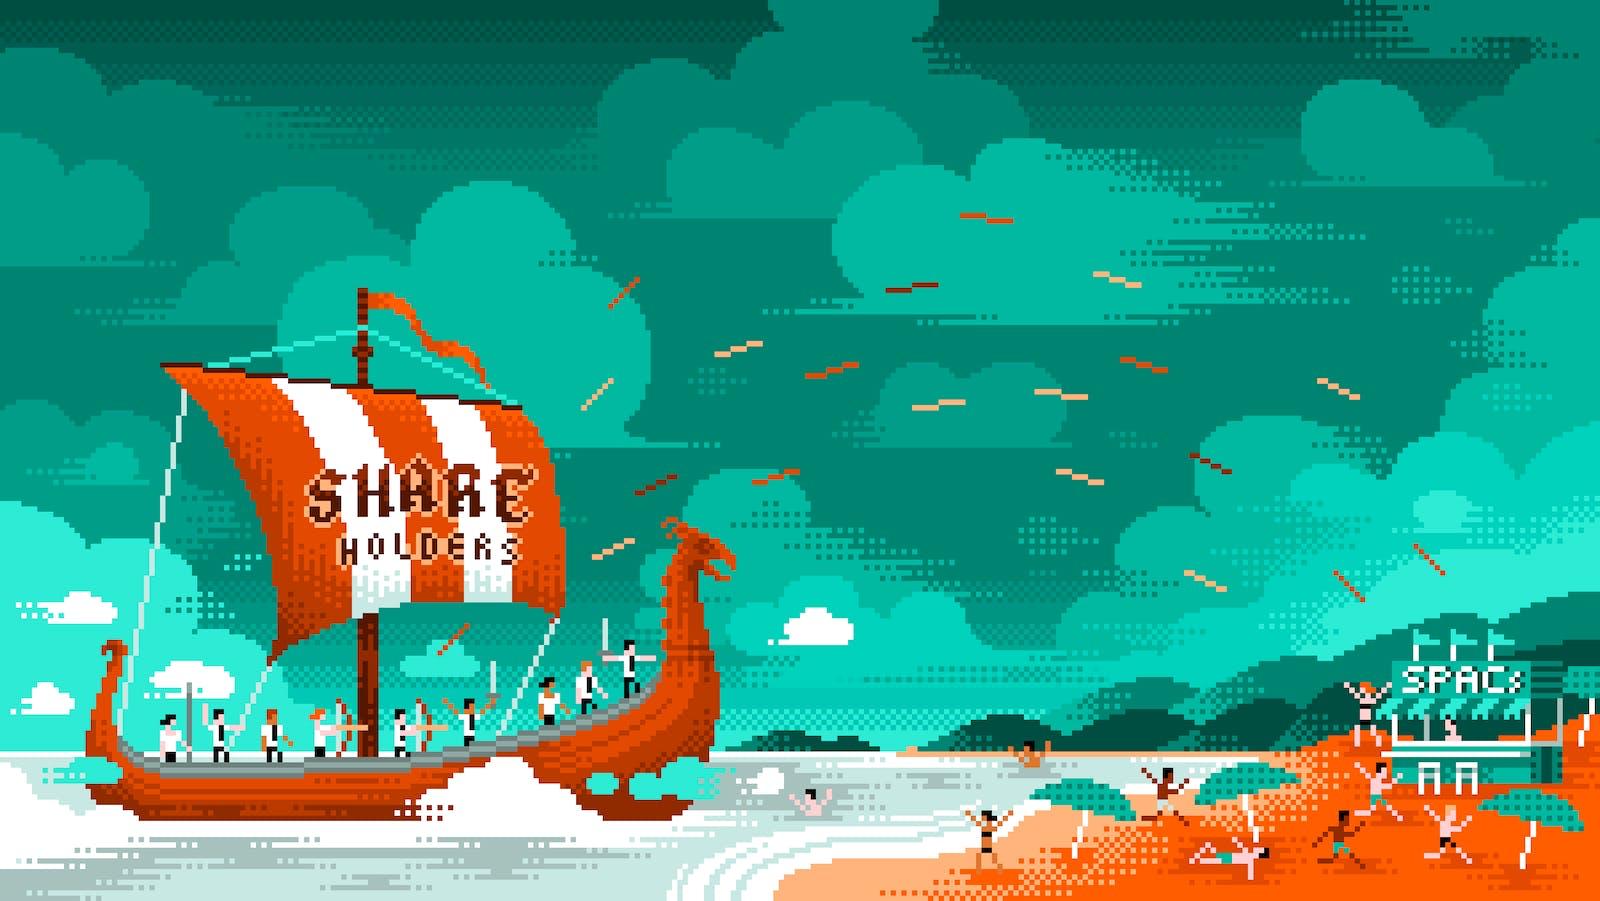 Illustration by Laurent Bazart